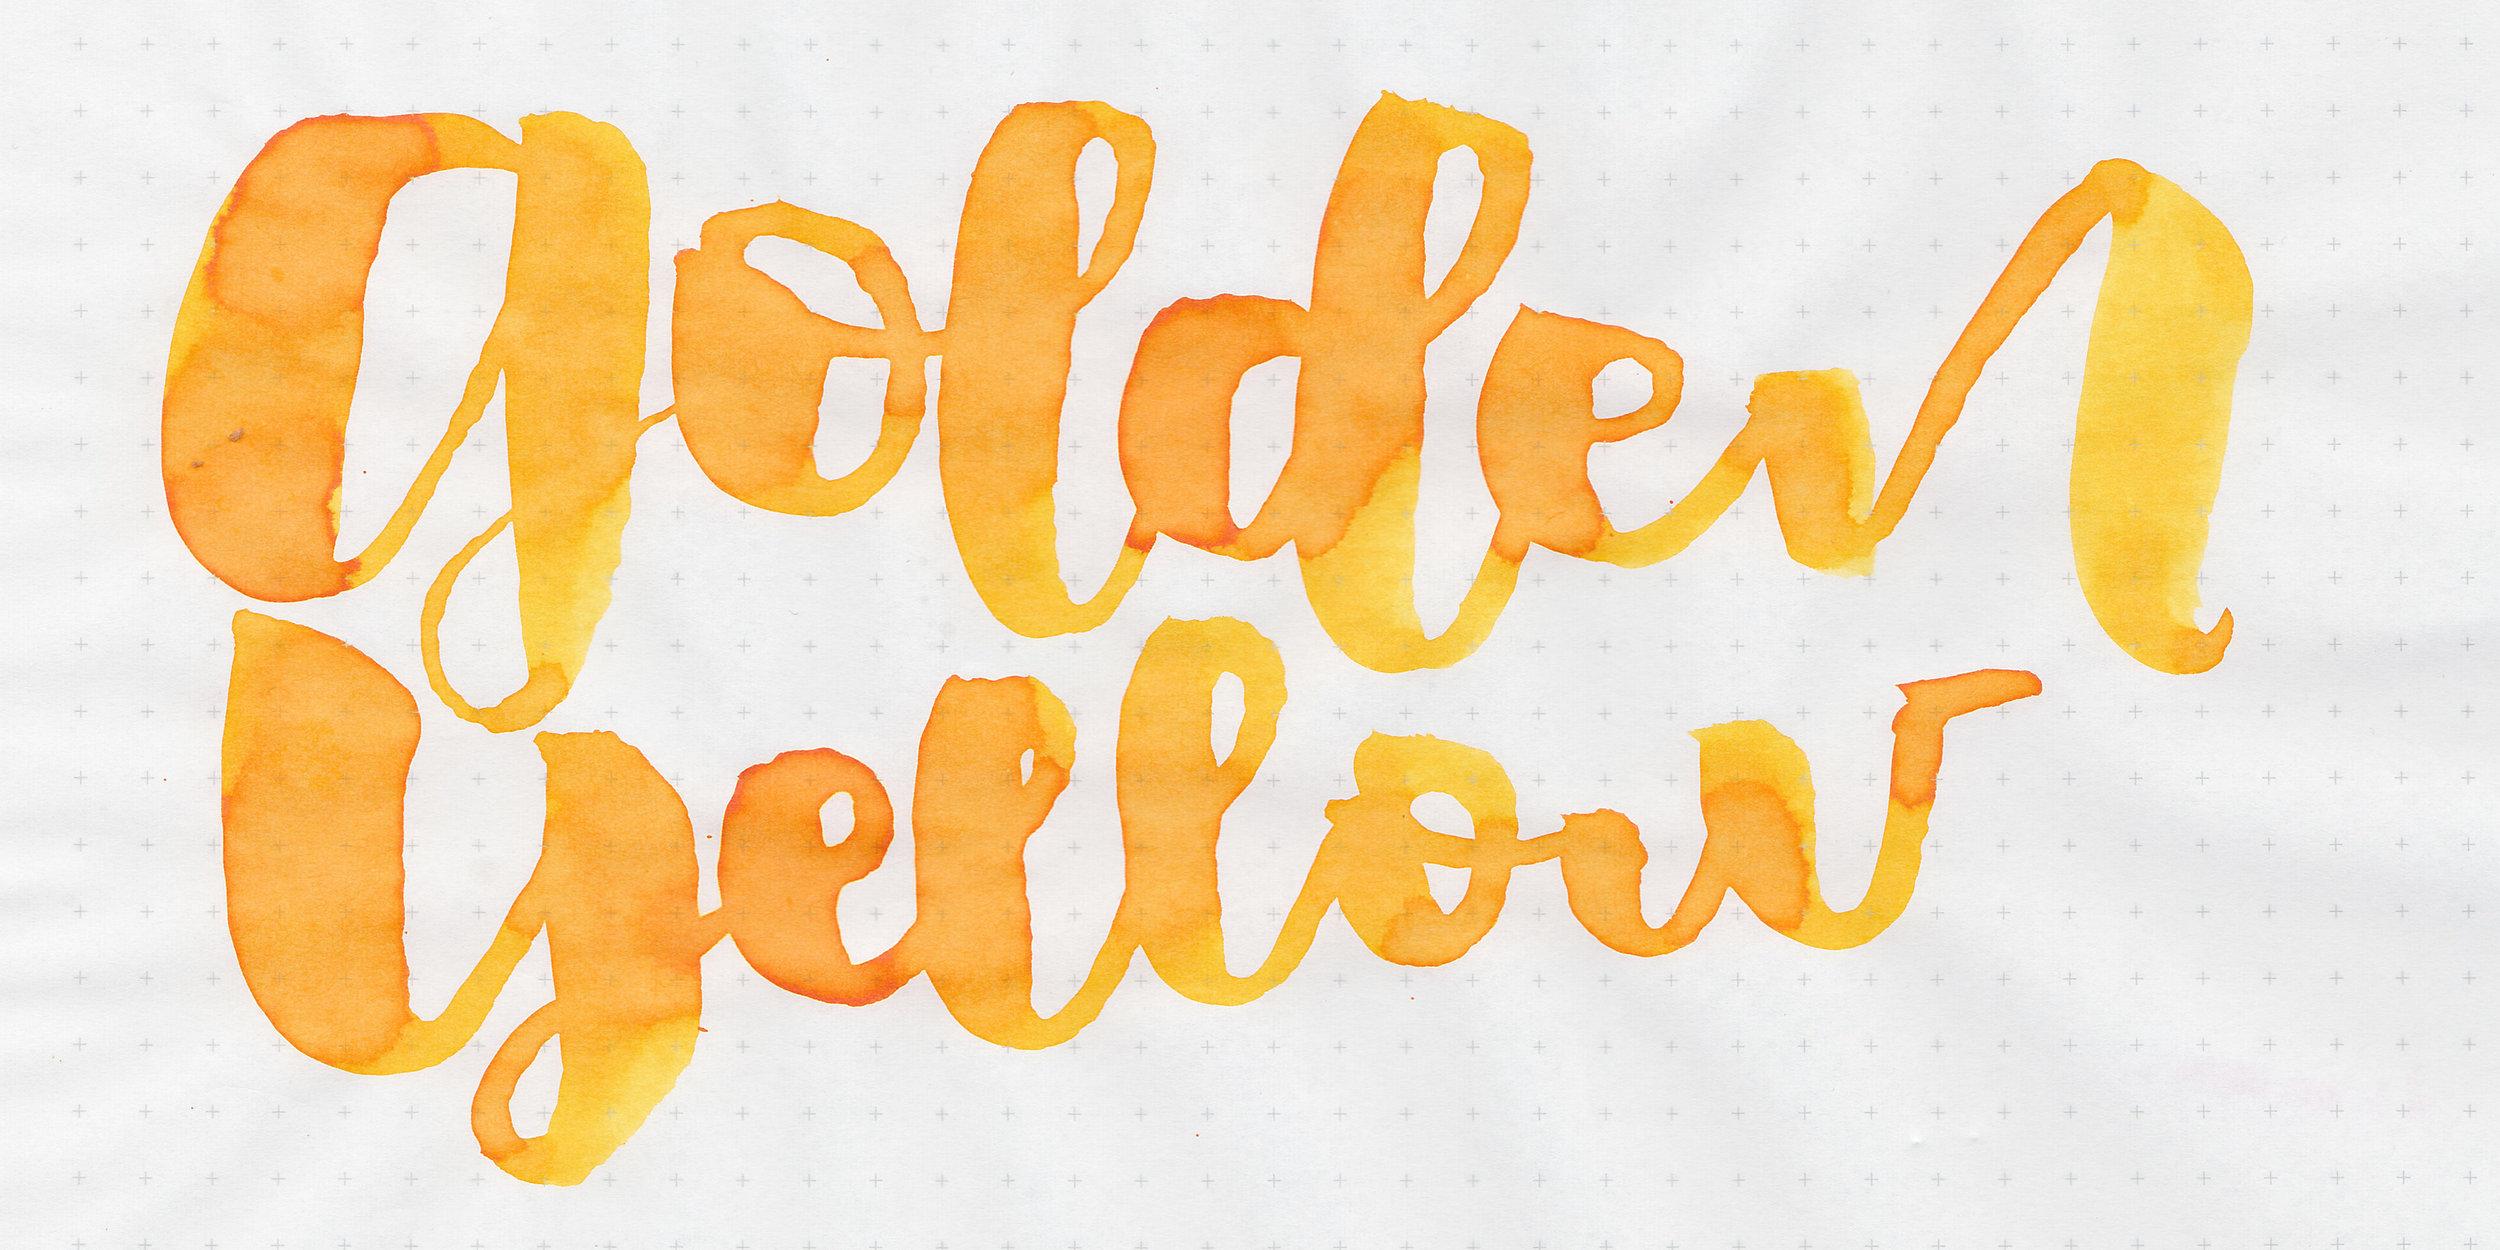 mb-golden-yellow-5.jpg